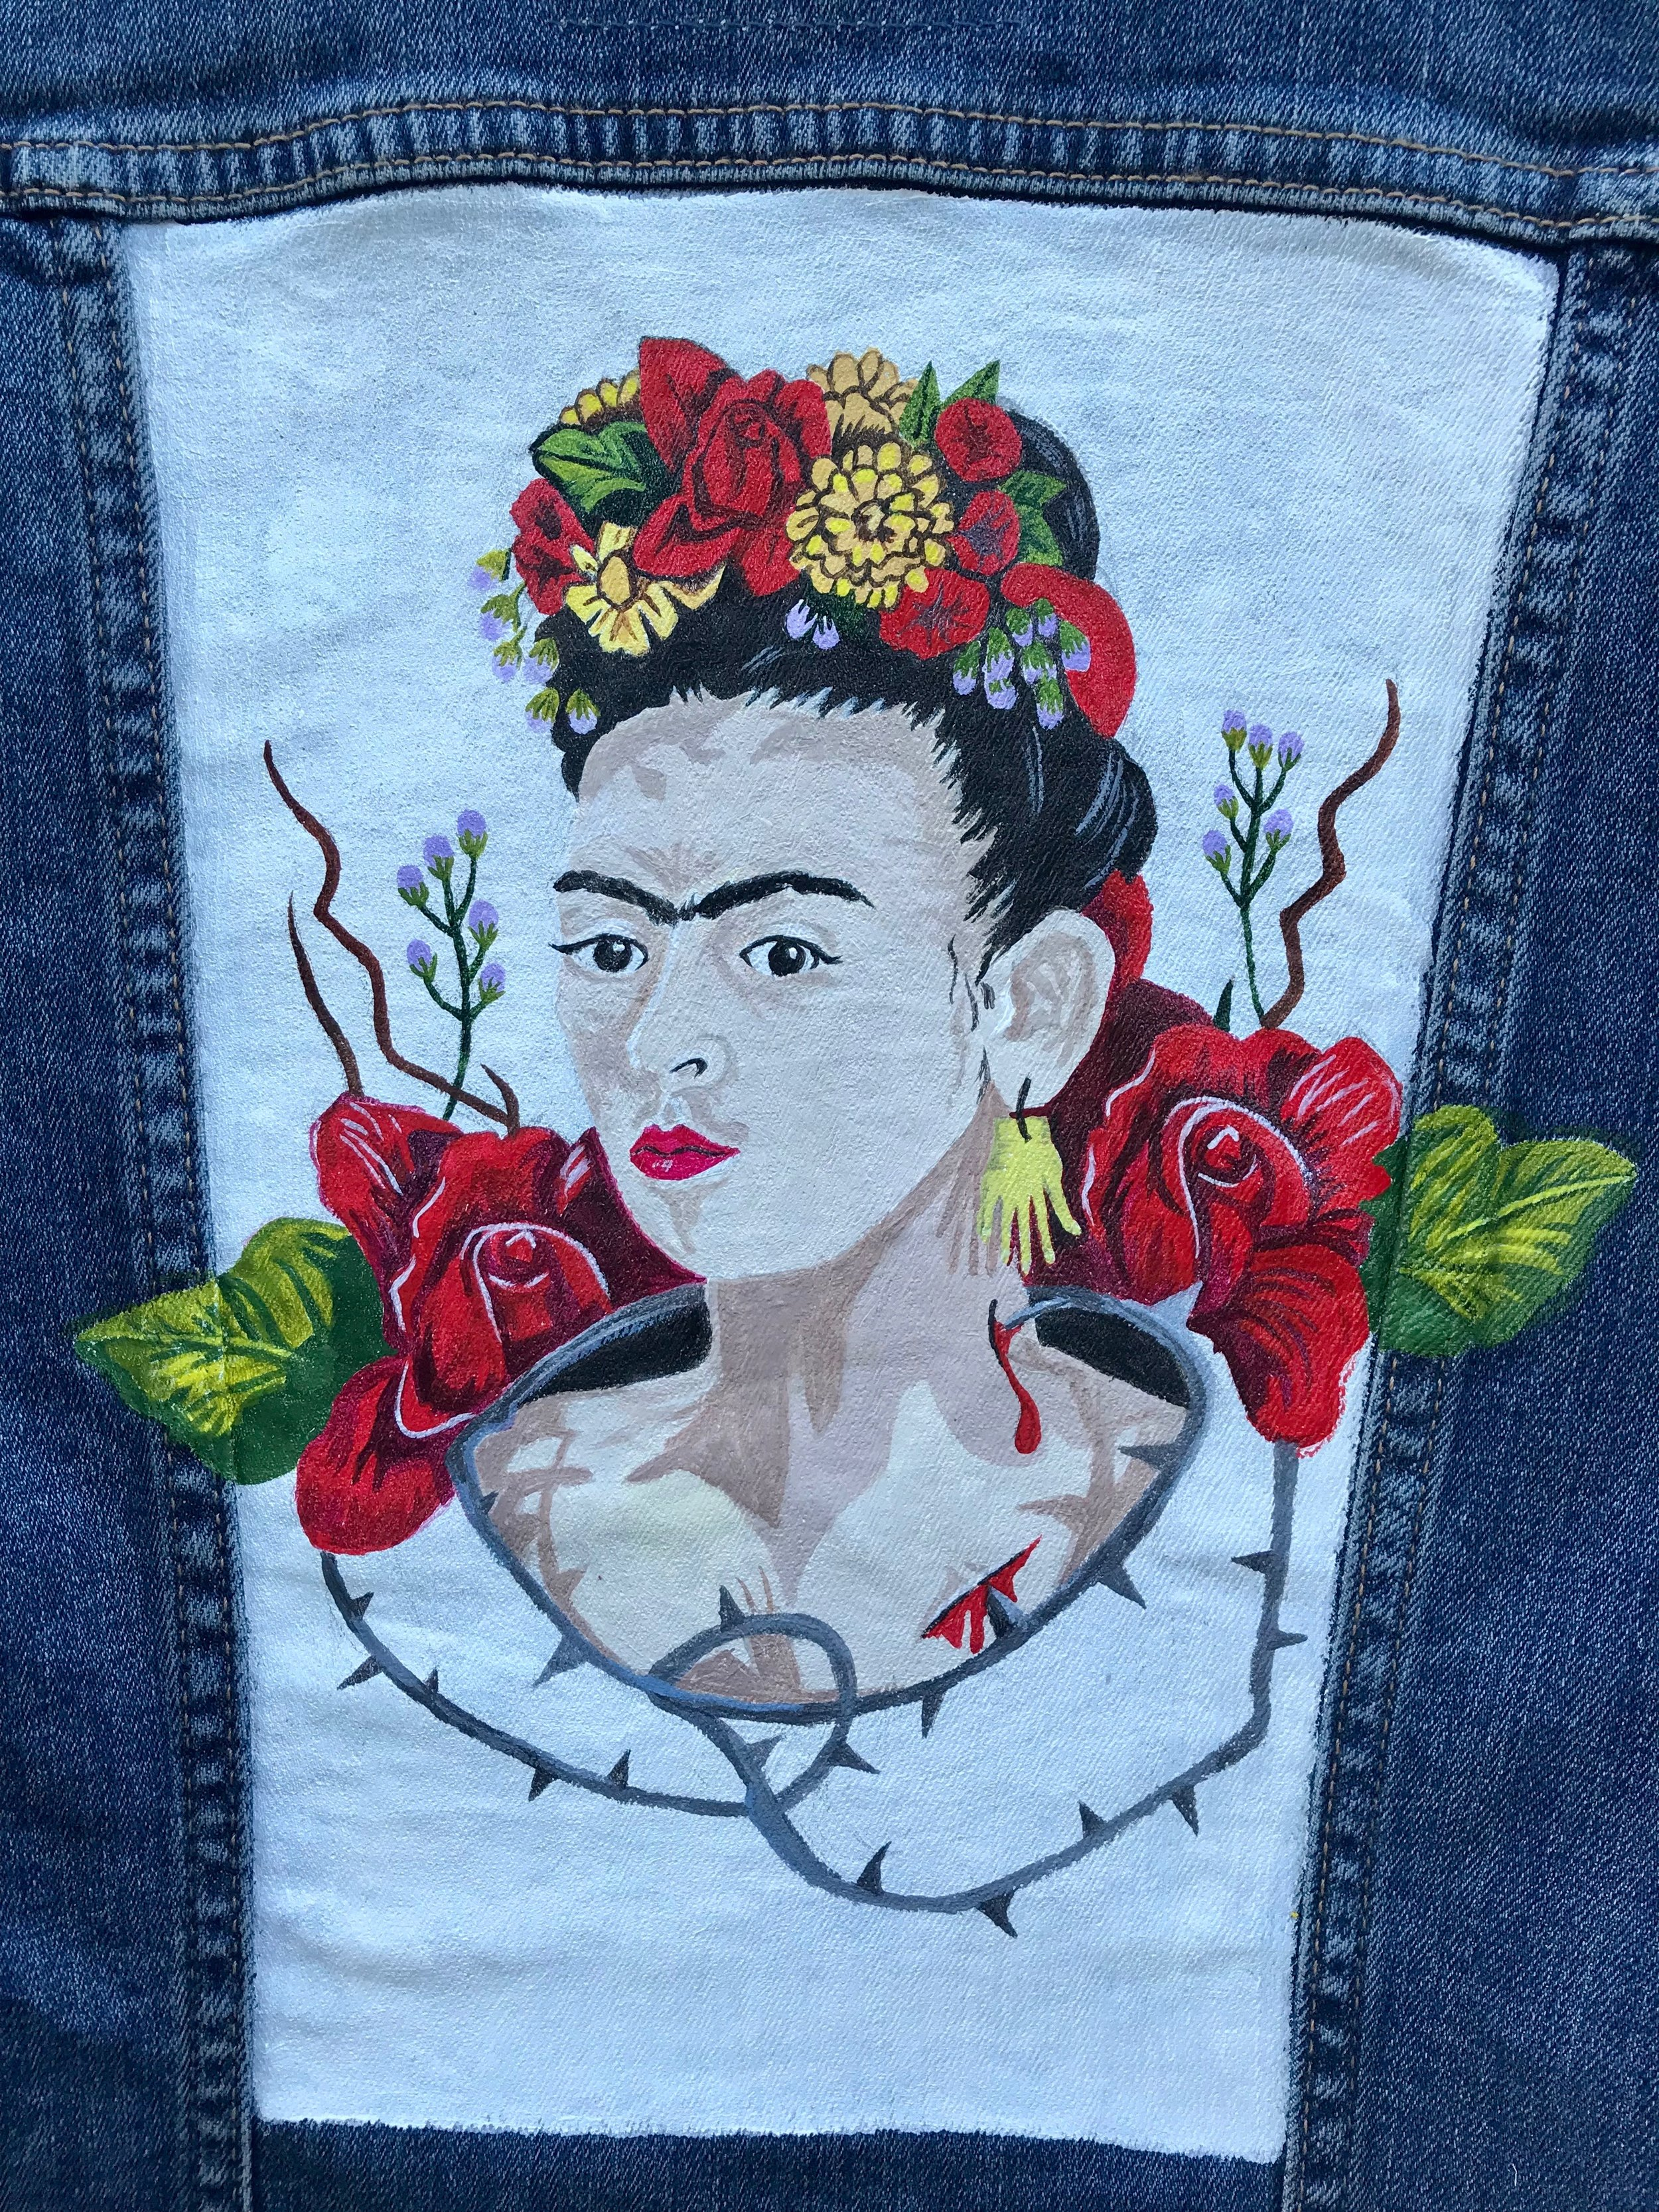 Day 296. Hand-Painted Frida Kahlo Jean Jacket